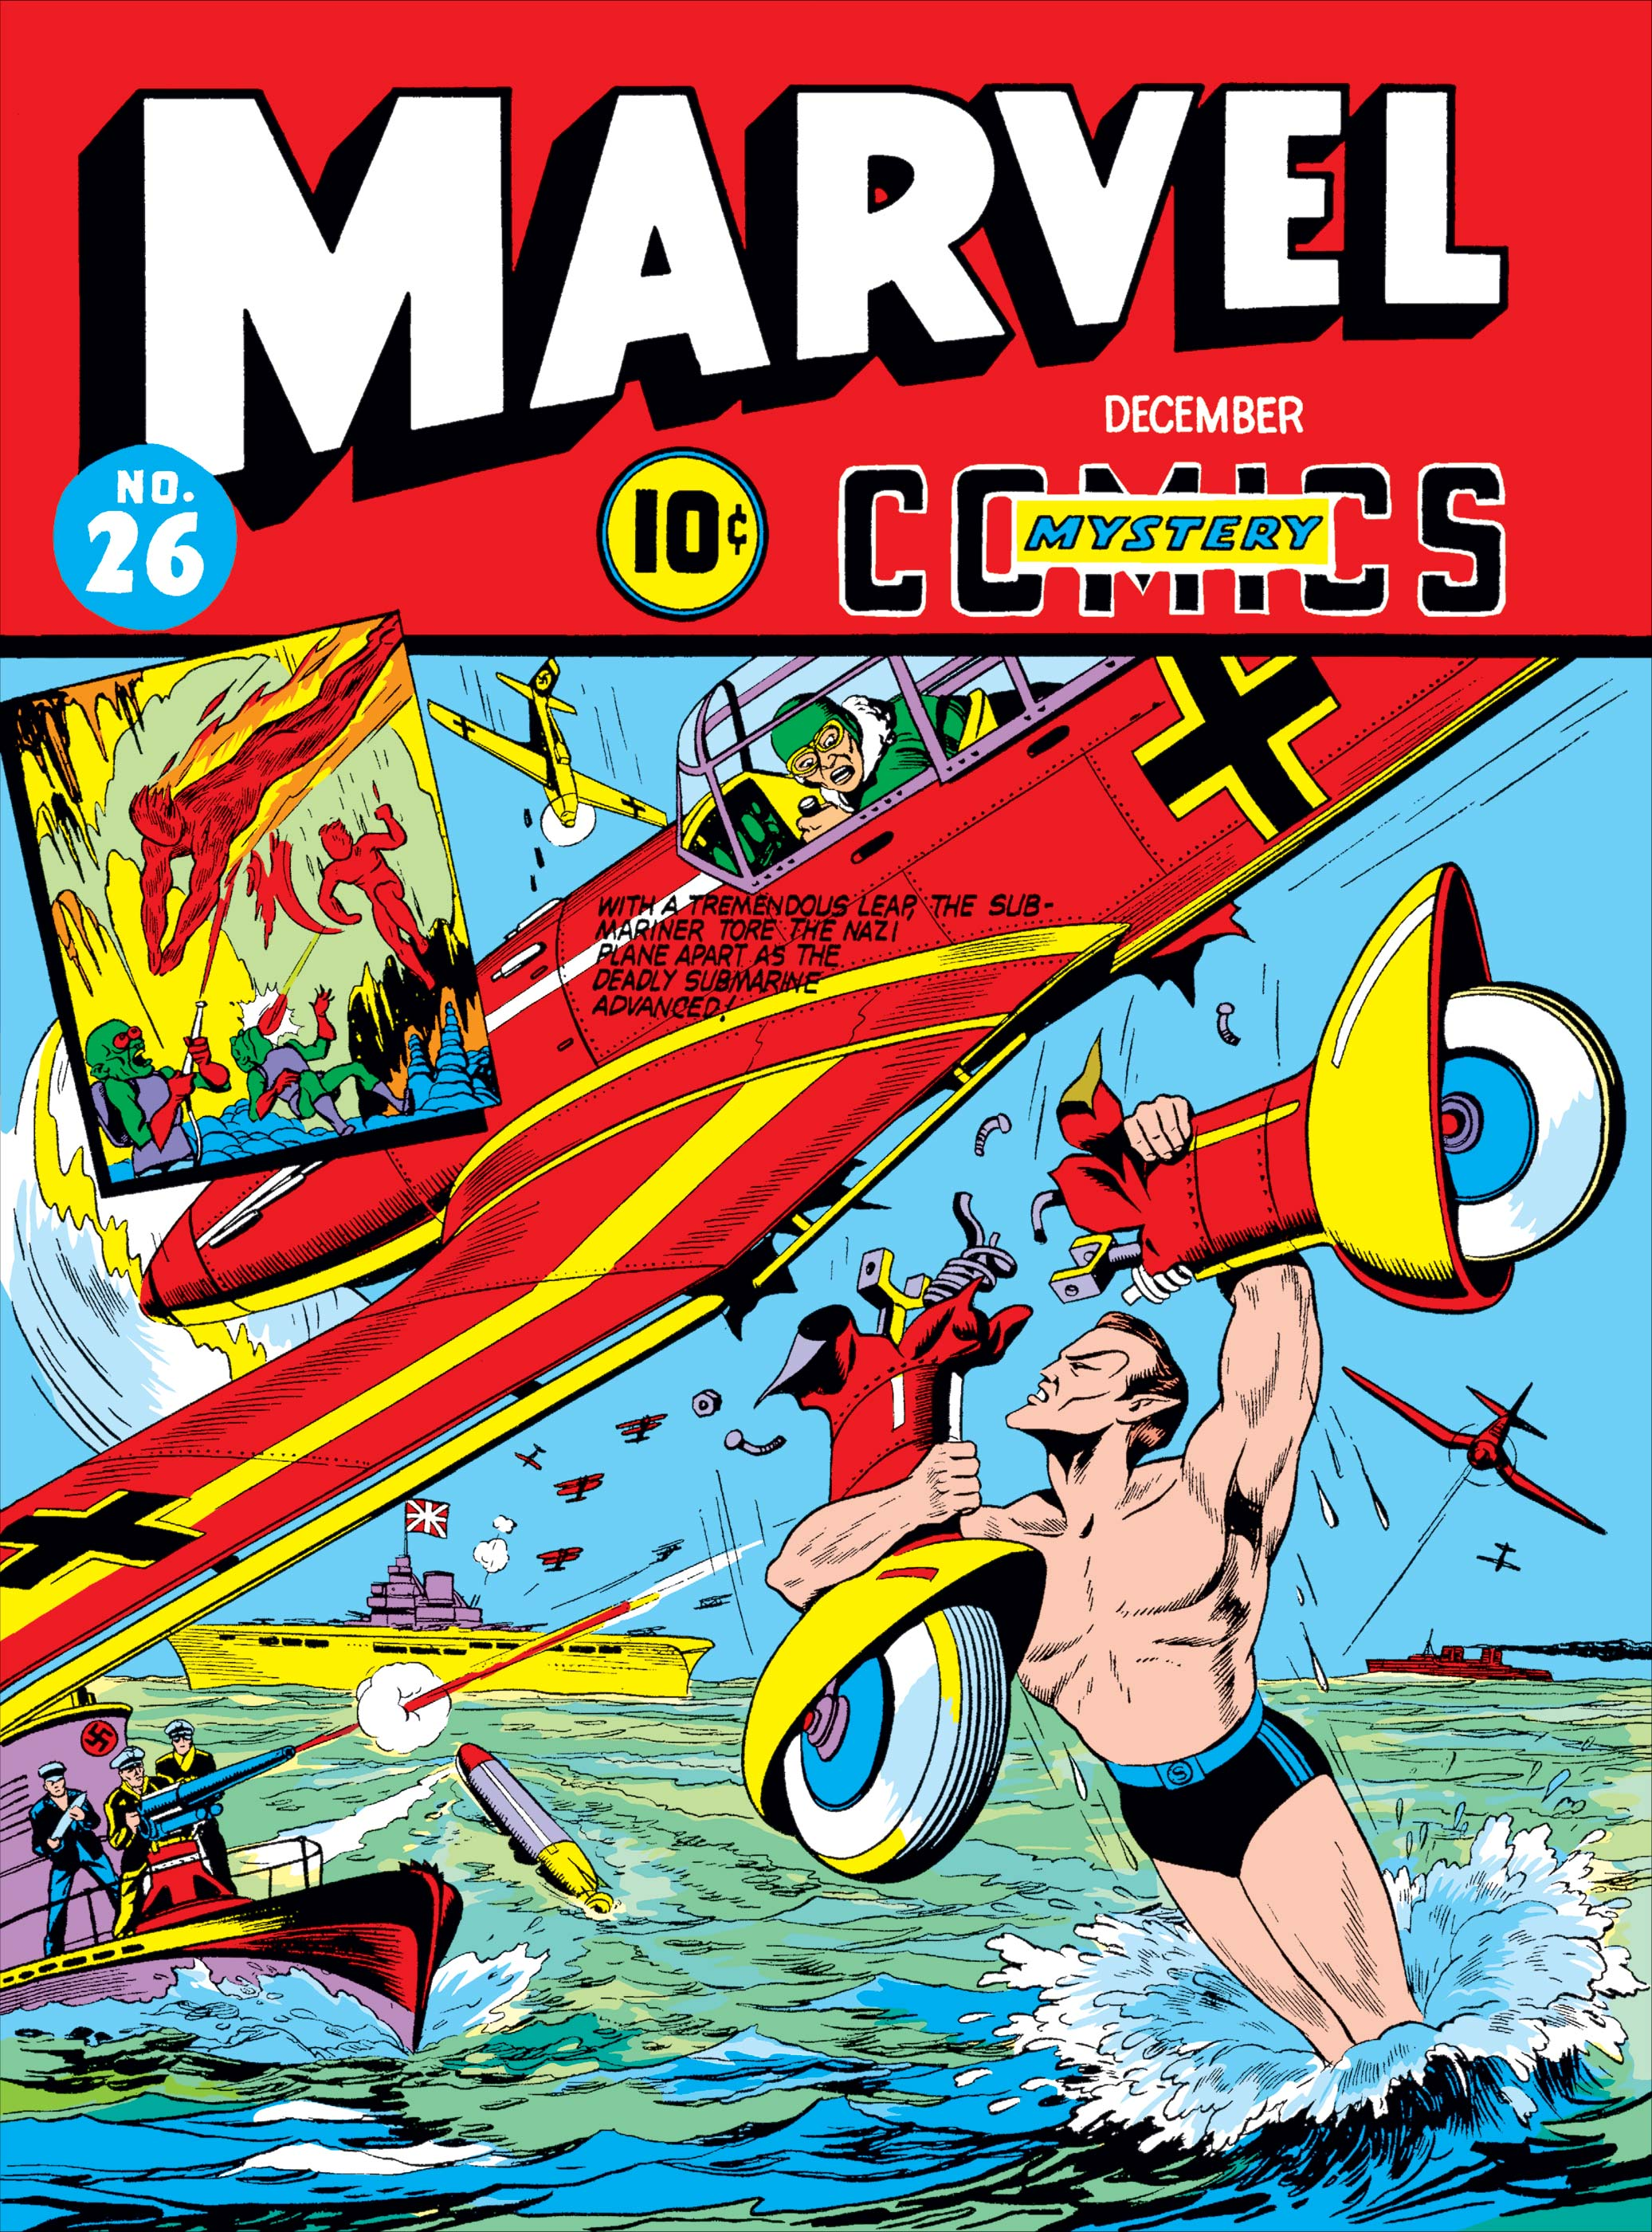 Marvel Mystery Comics (1939) #26